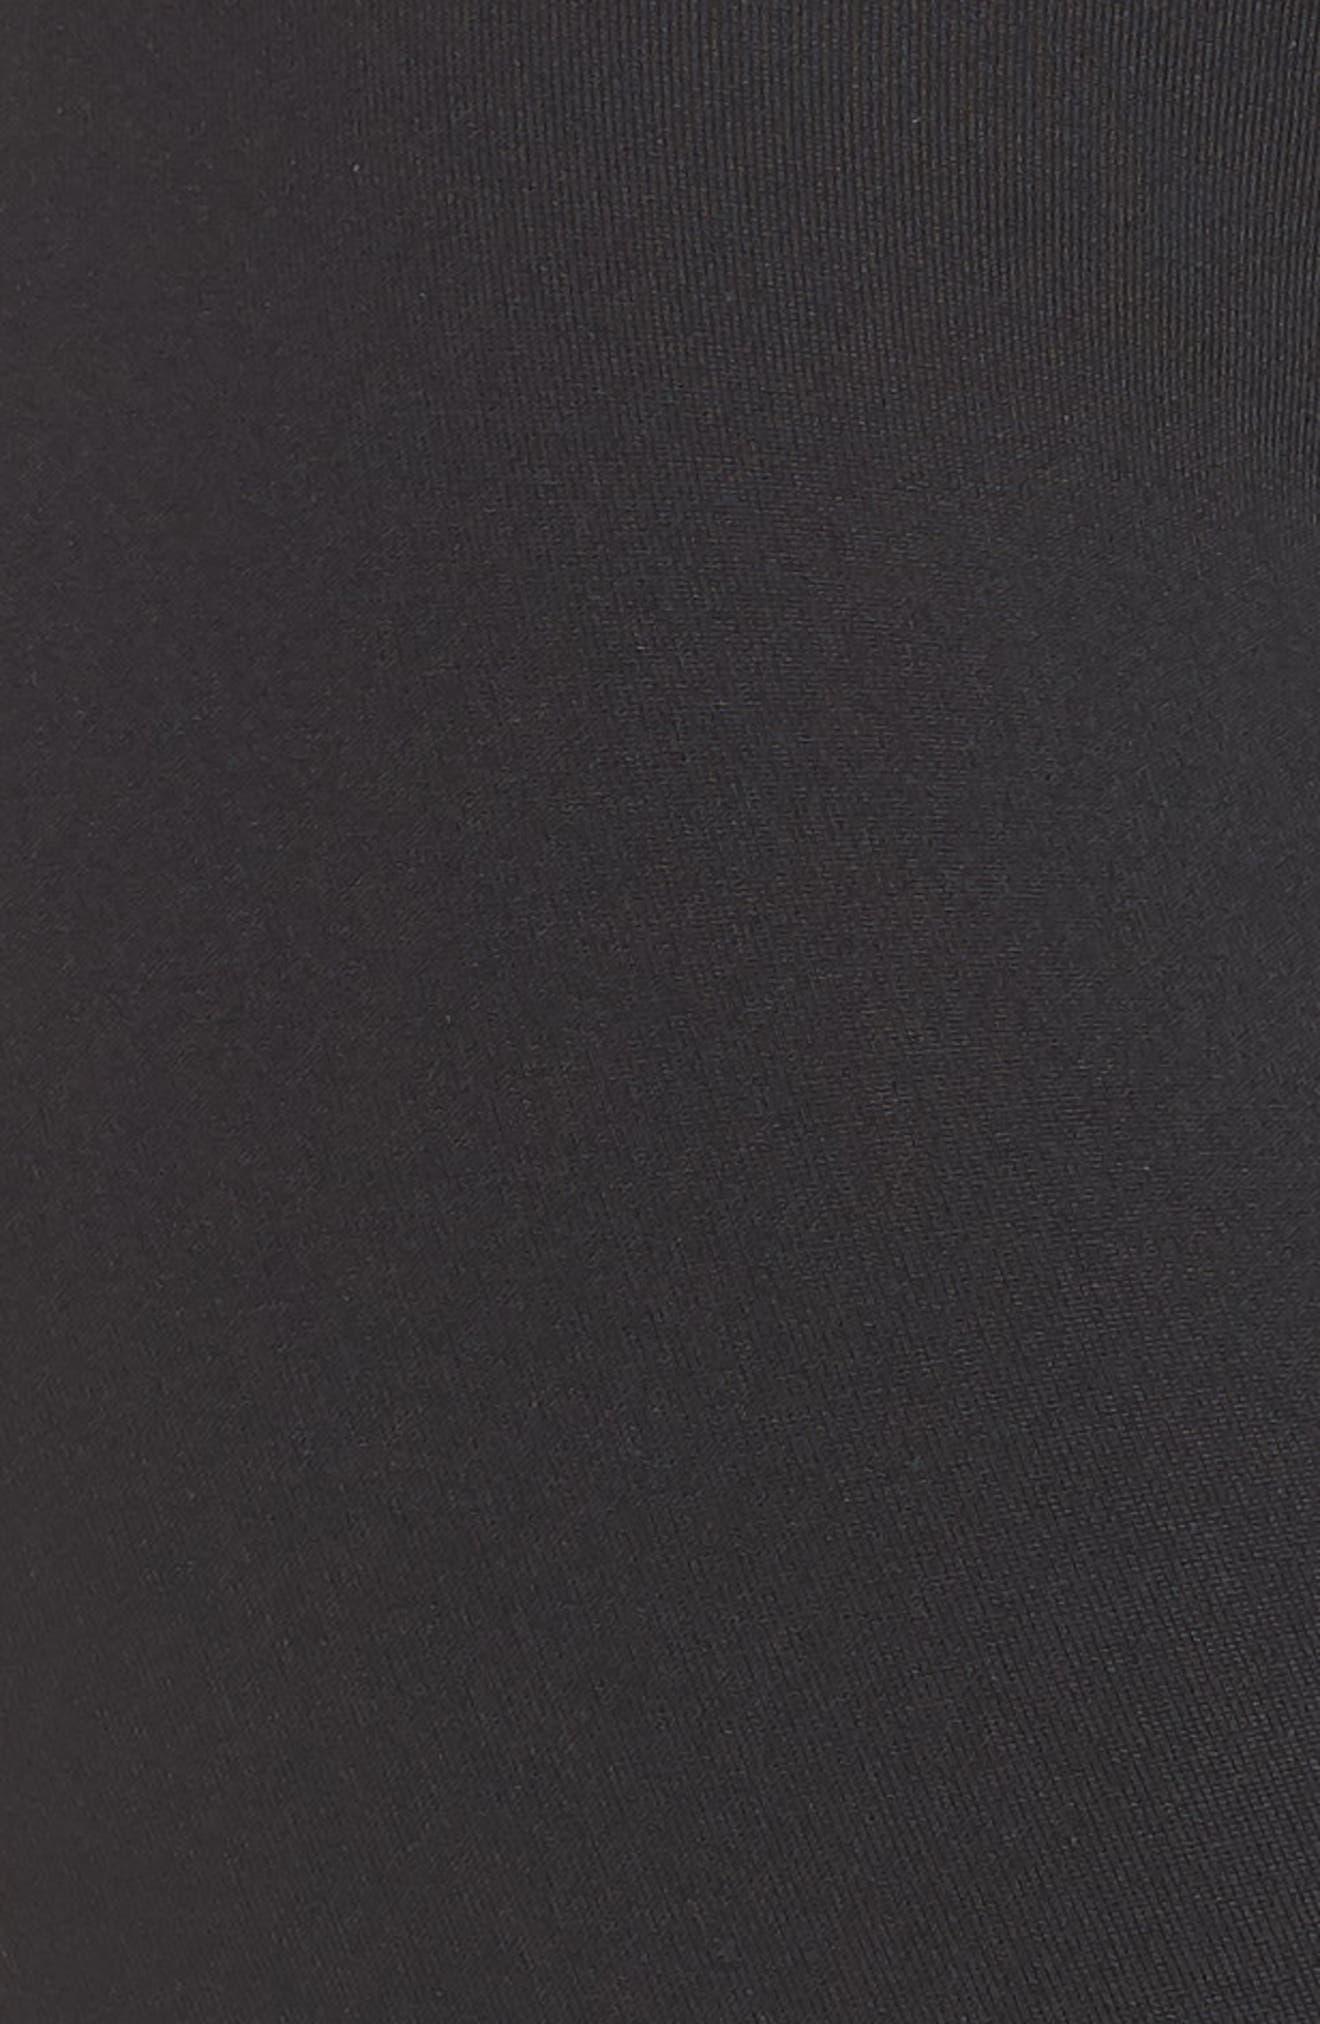 Rose Perfect High Waist Leggings,                             Alternate thumbnail 6, color,                             VINTAGE BLACK